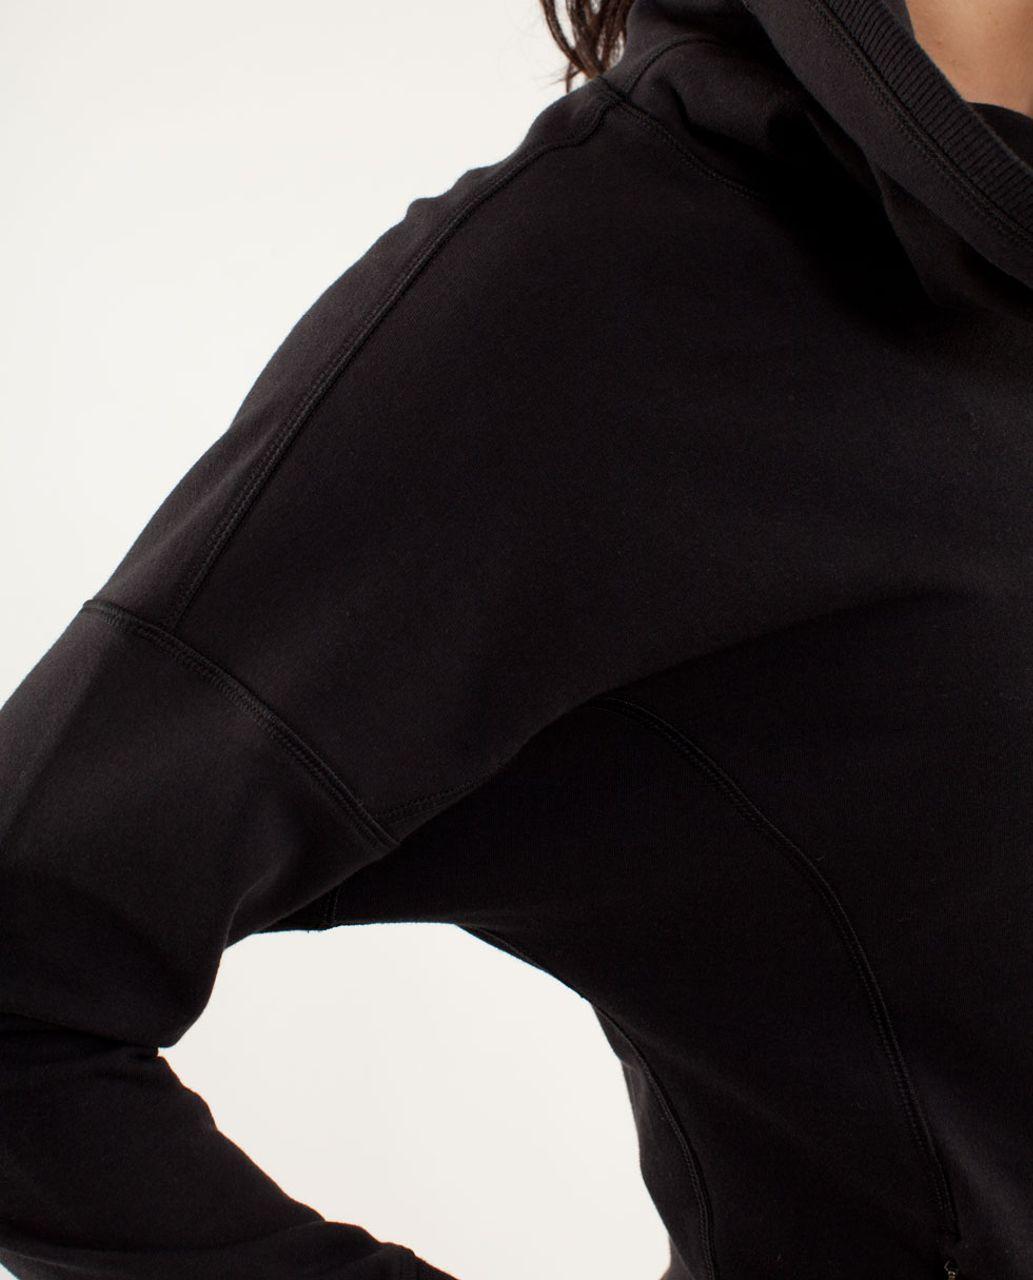 Lululemon Rest Day Pullover - Black